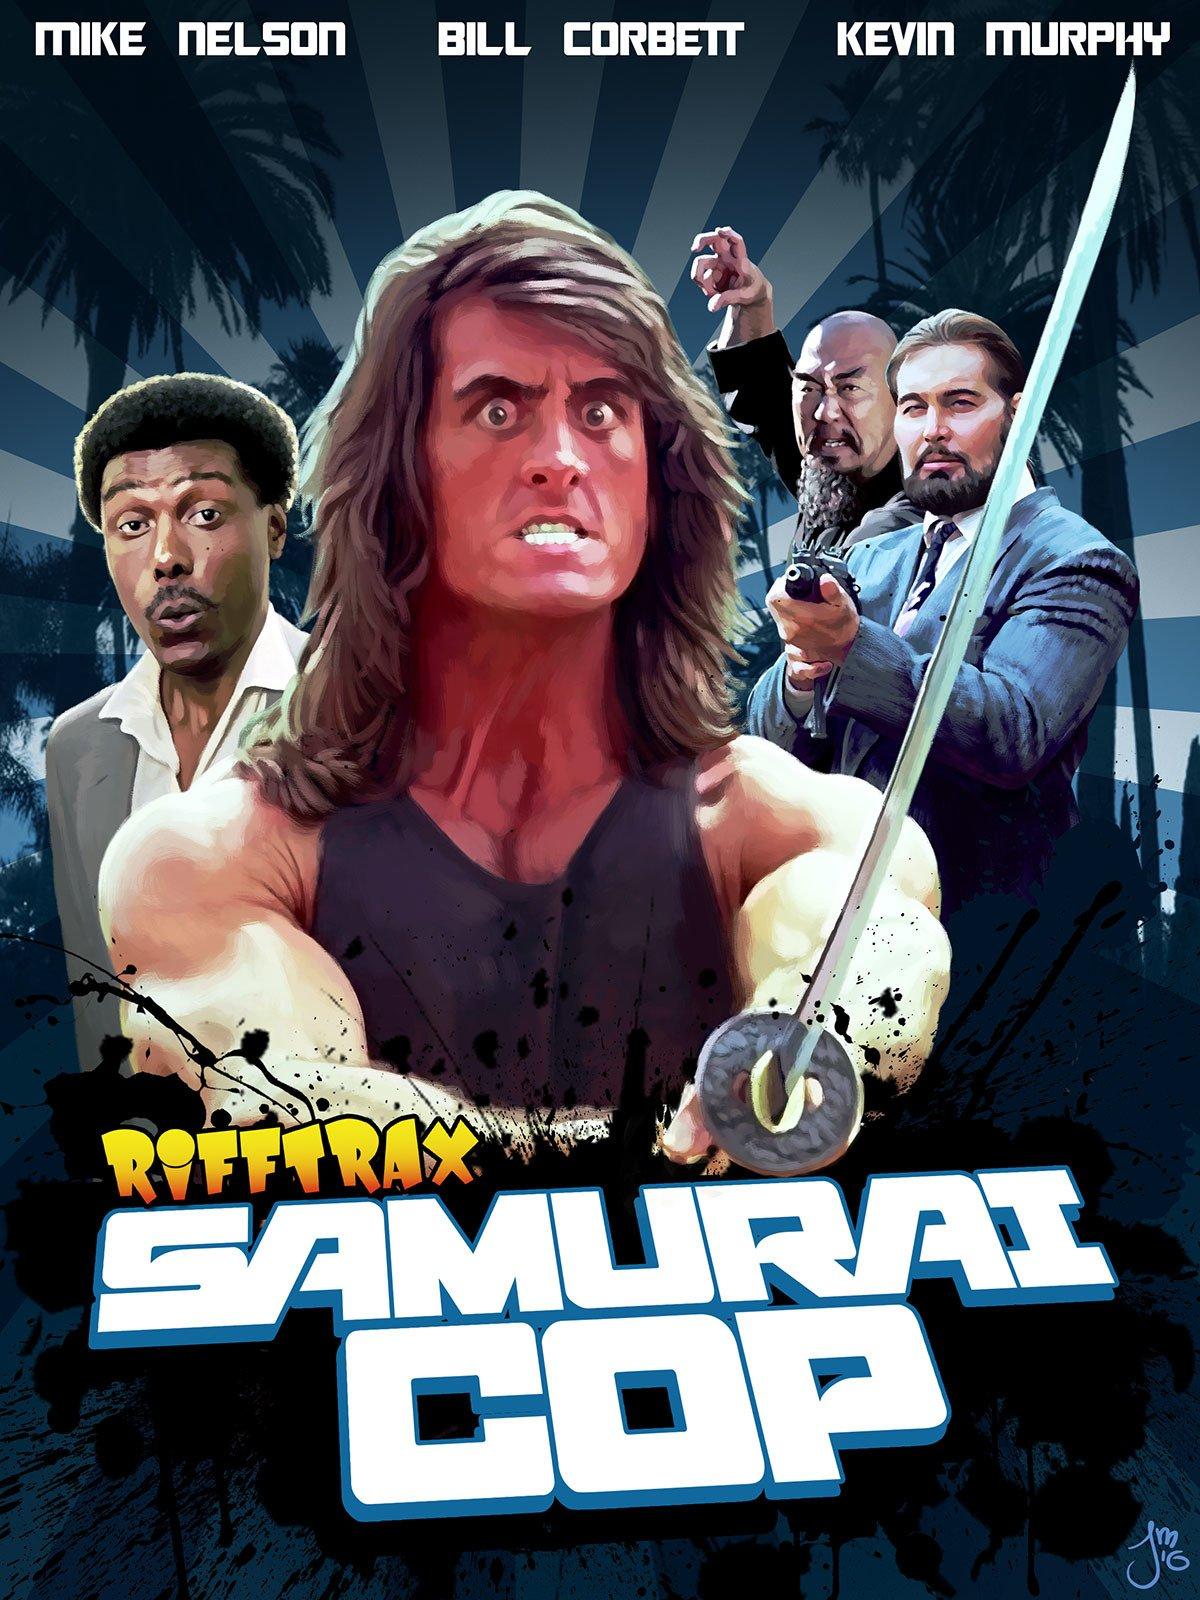 RiffTrax: Samurai Cop on Amazon Prime Video UK